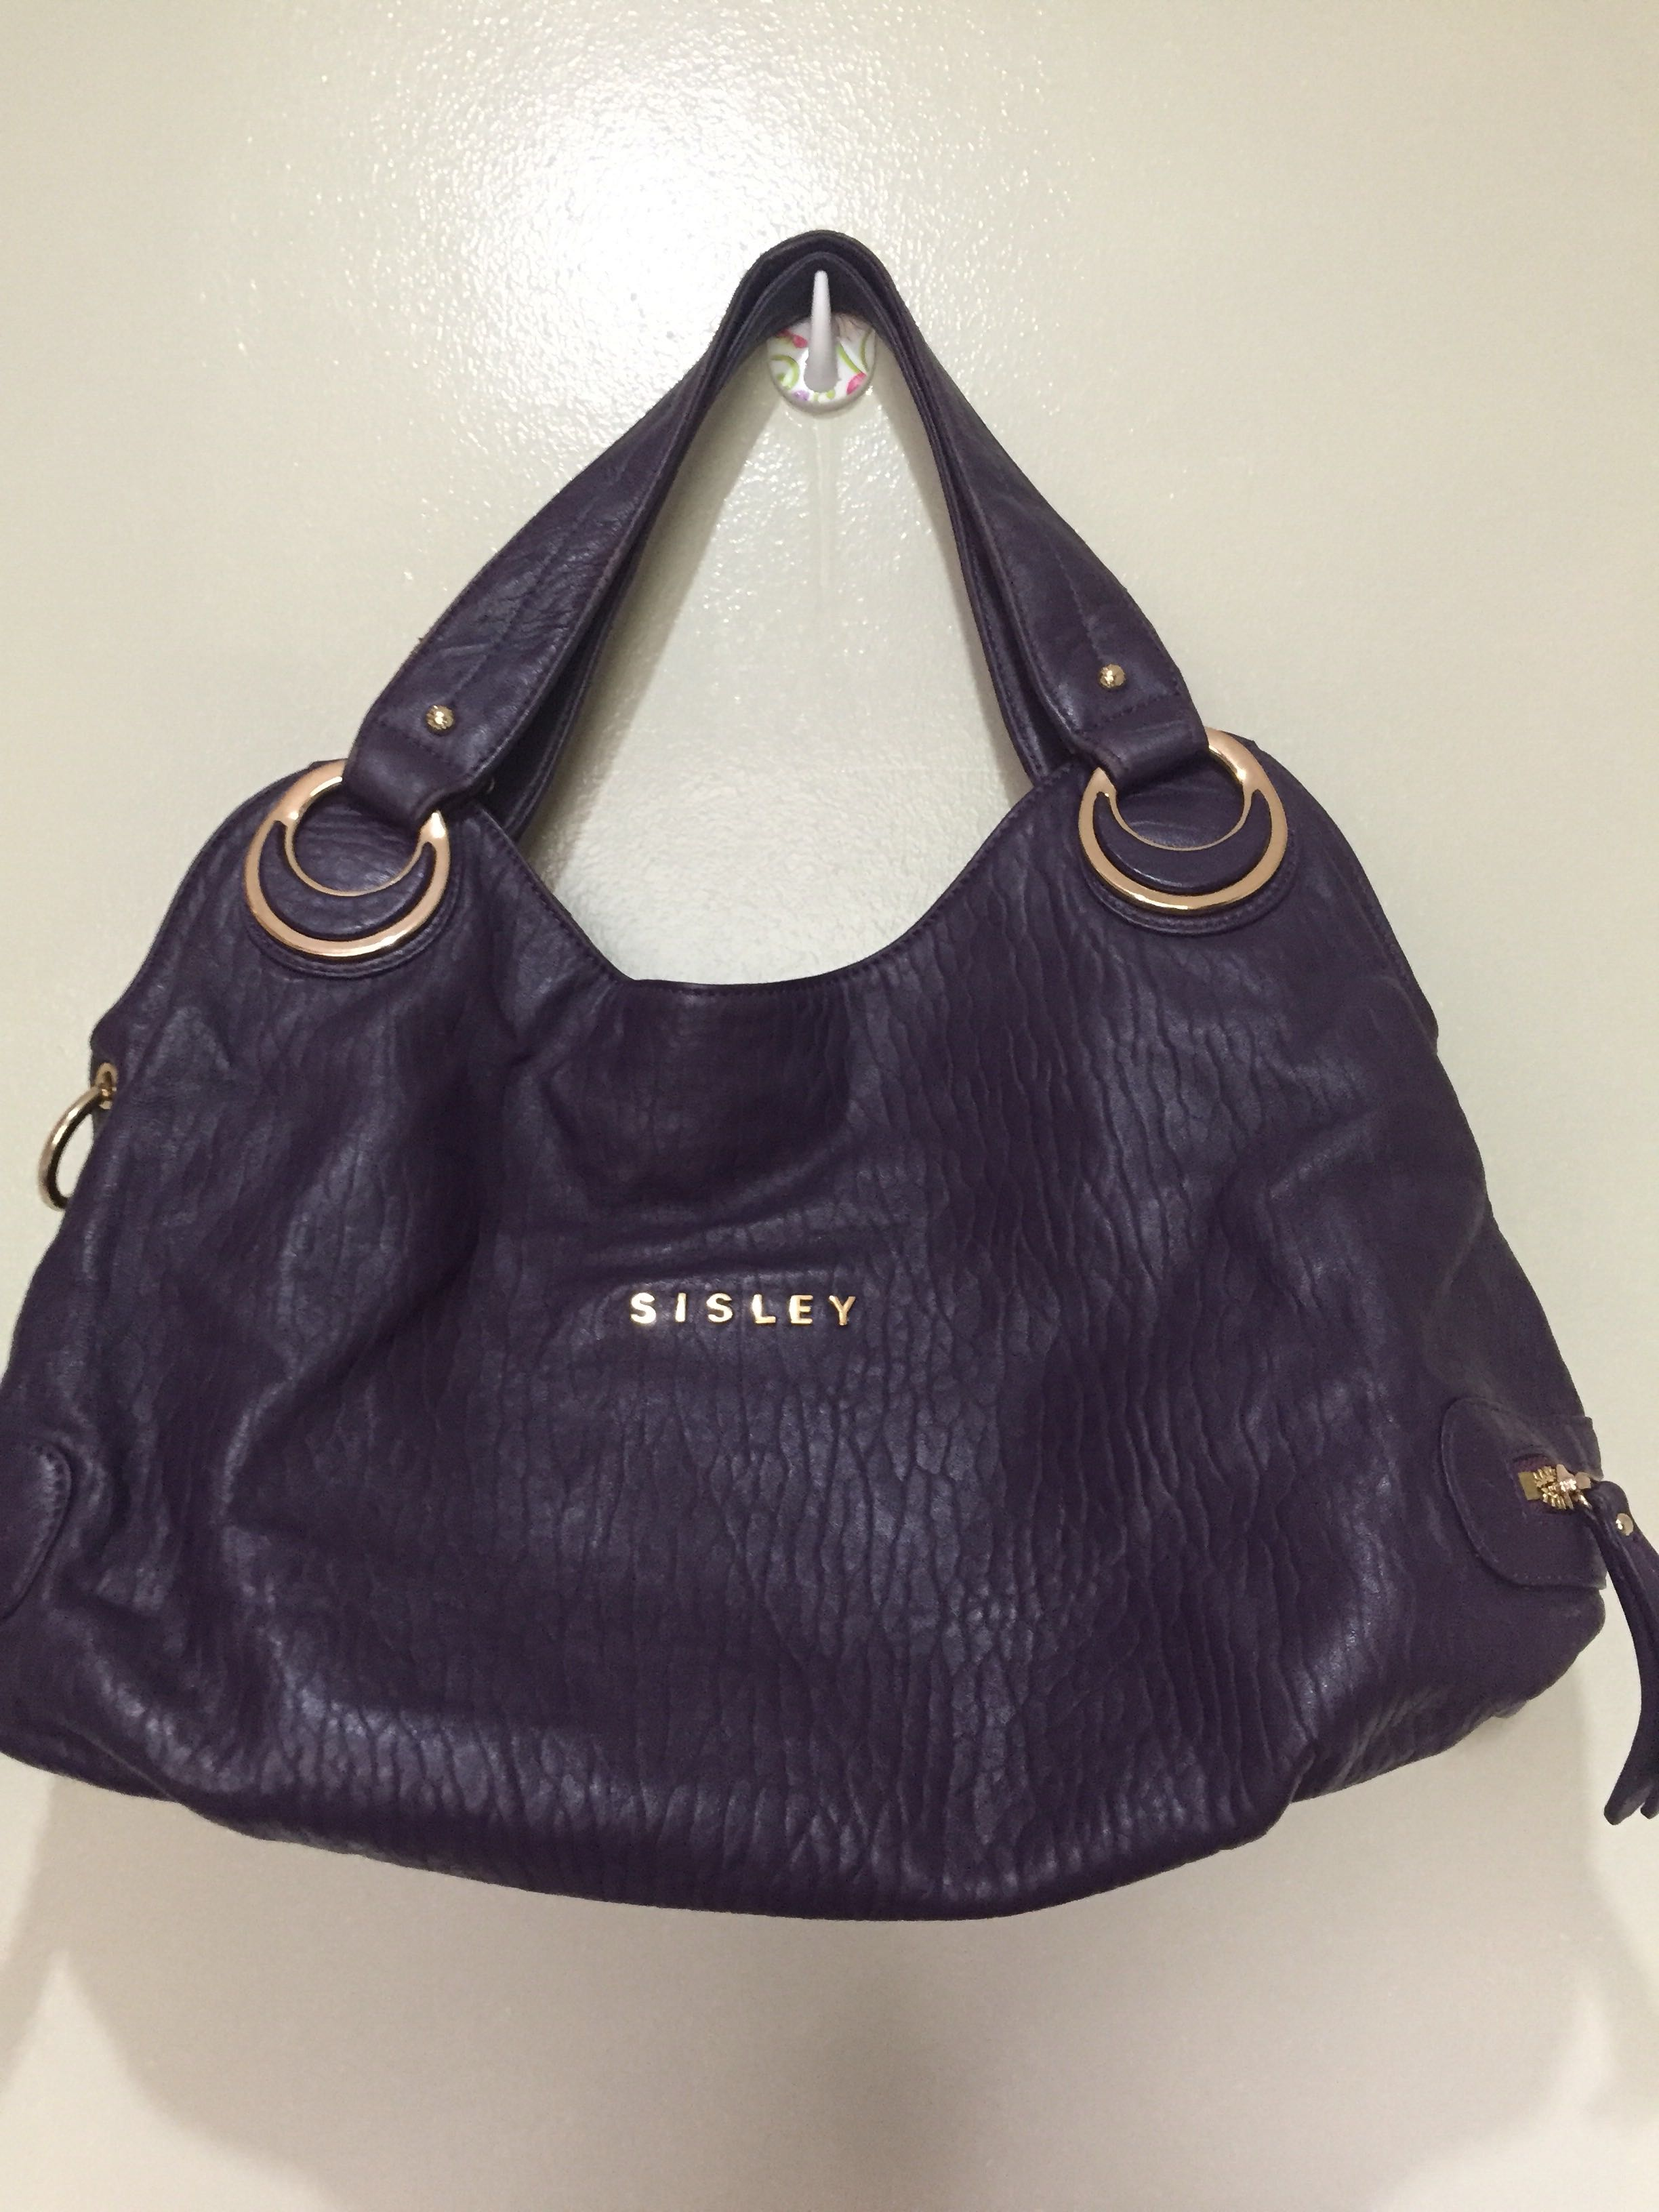 For sale Preloved Sisley bag 9edfe9b94a626